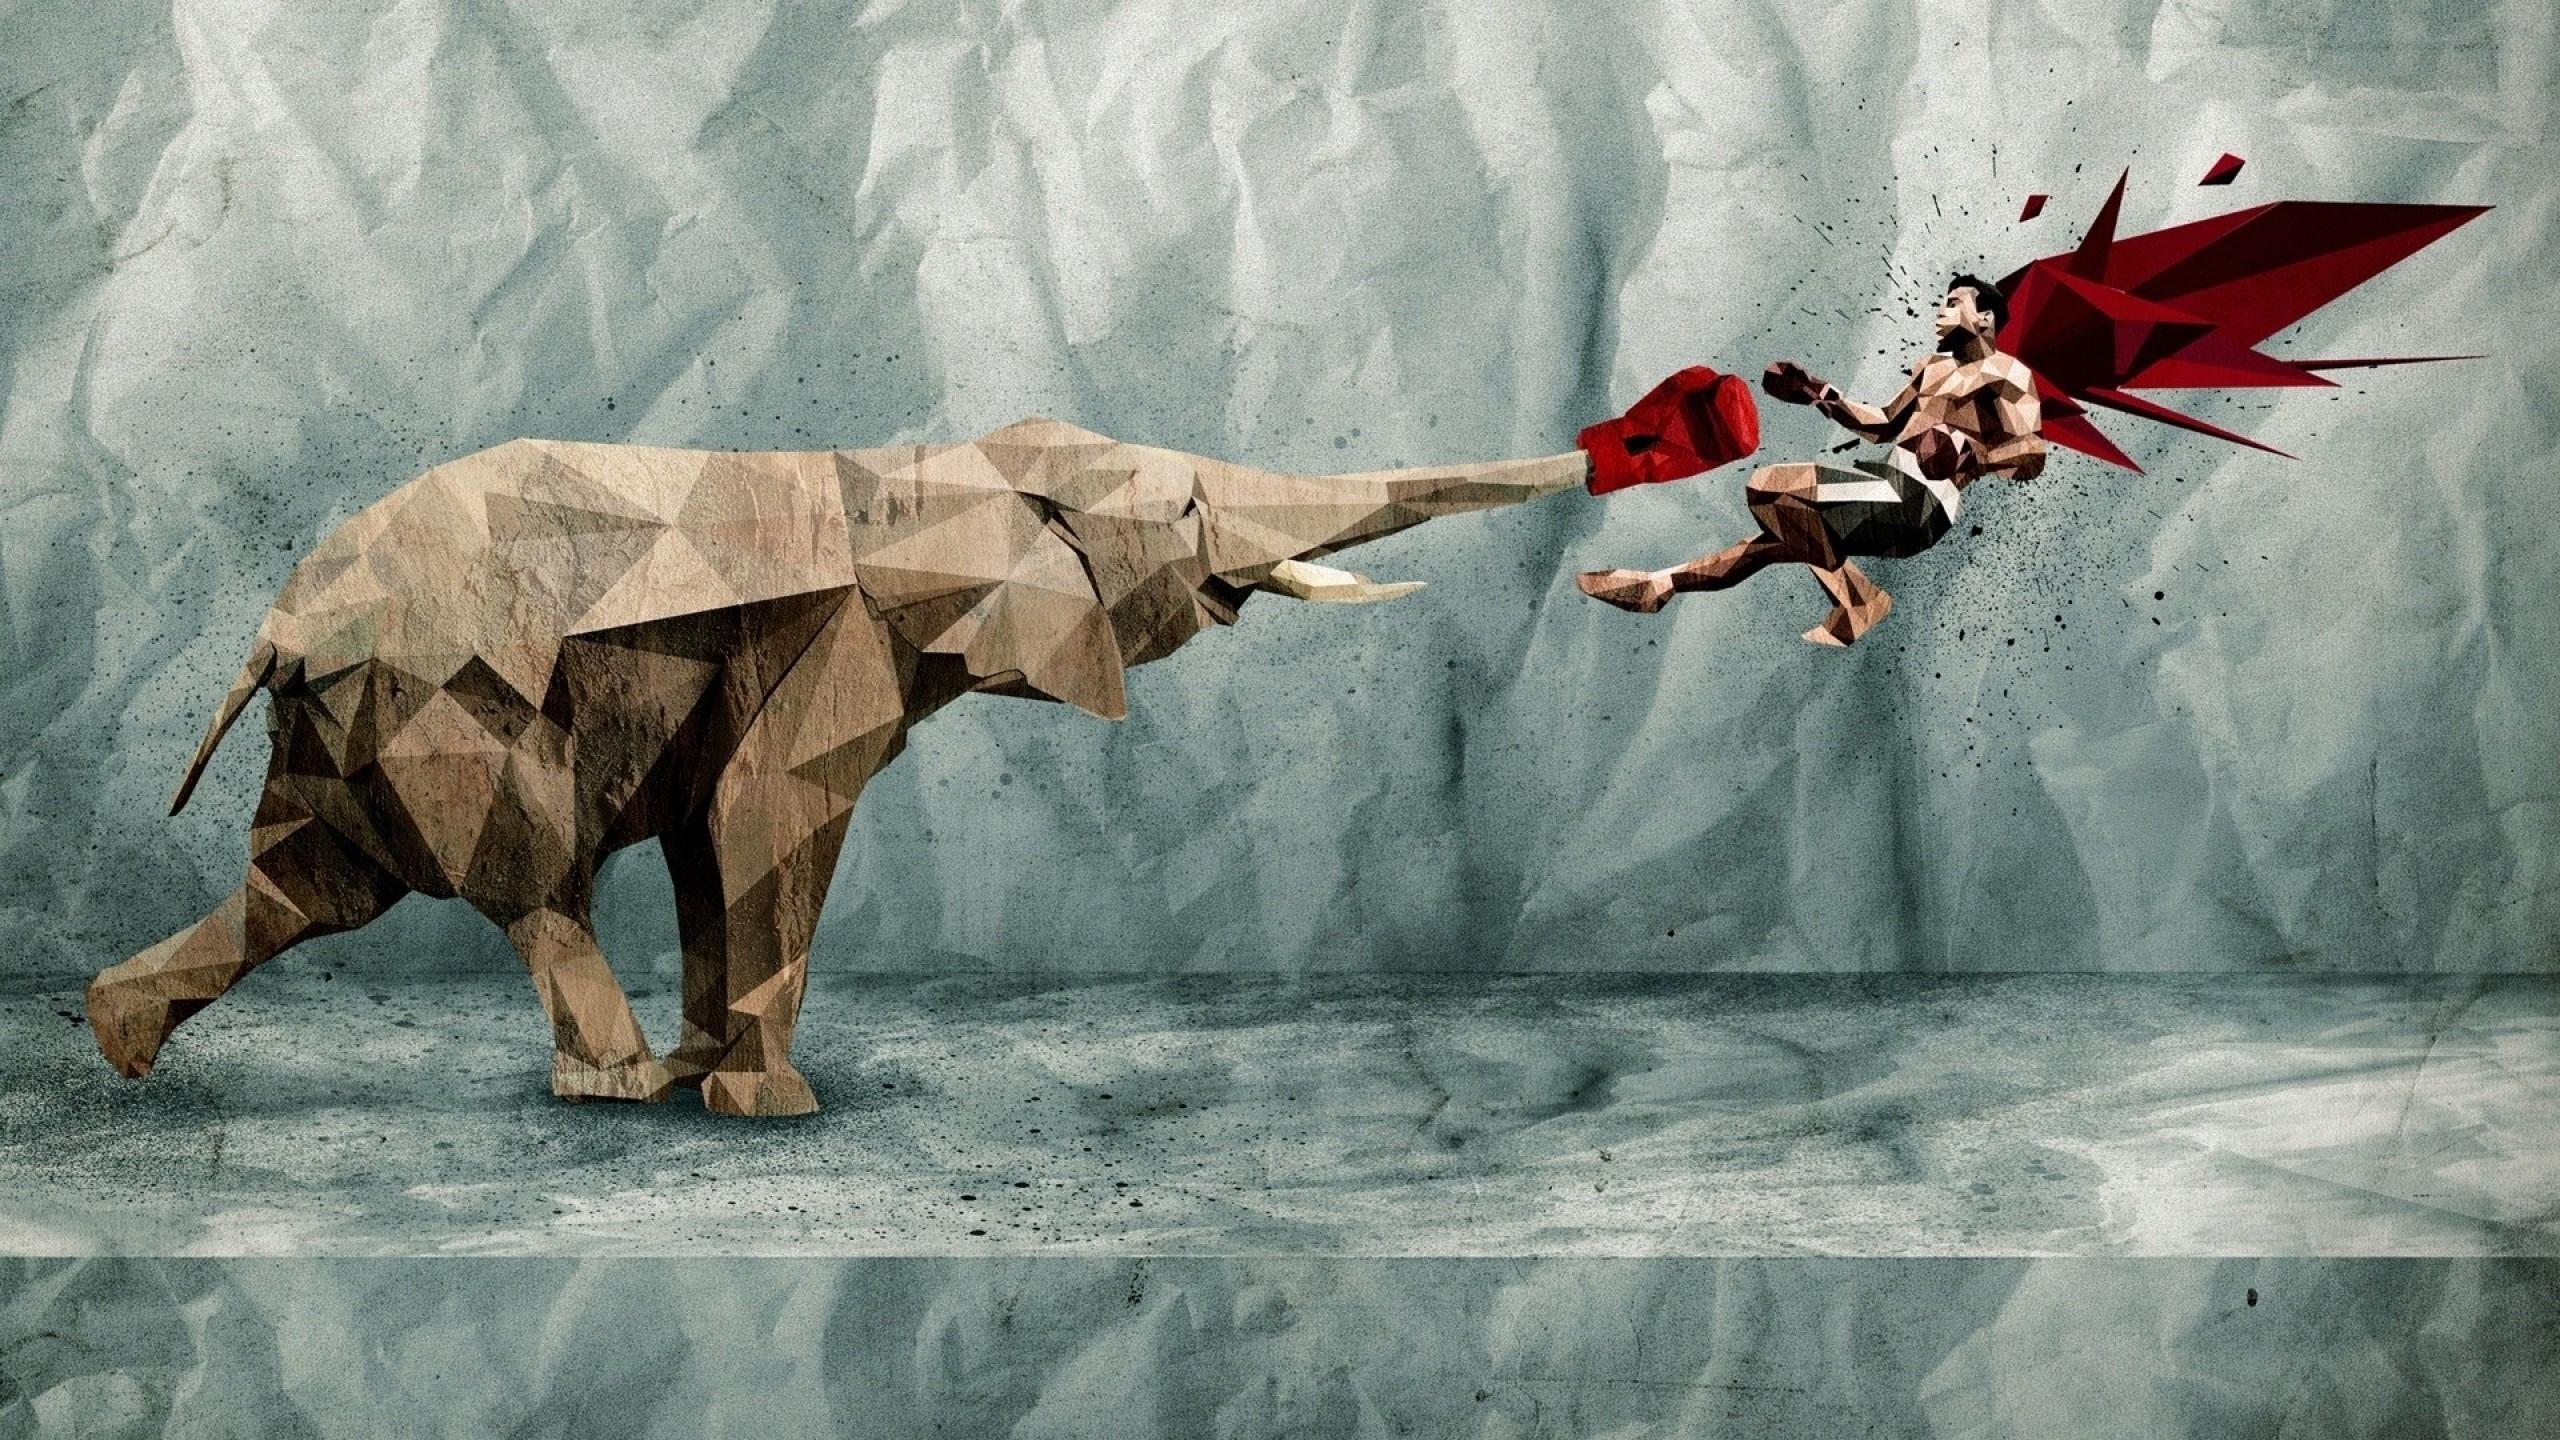 Res: 2560x1440, wallpaper digital art · elephants · boxing gloves